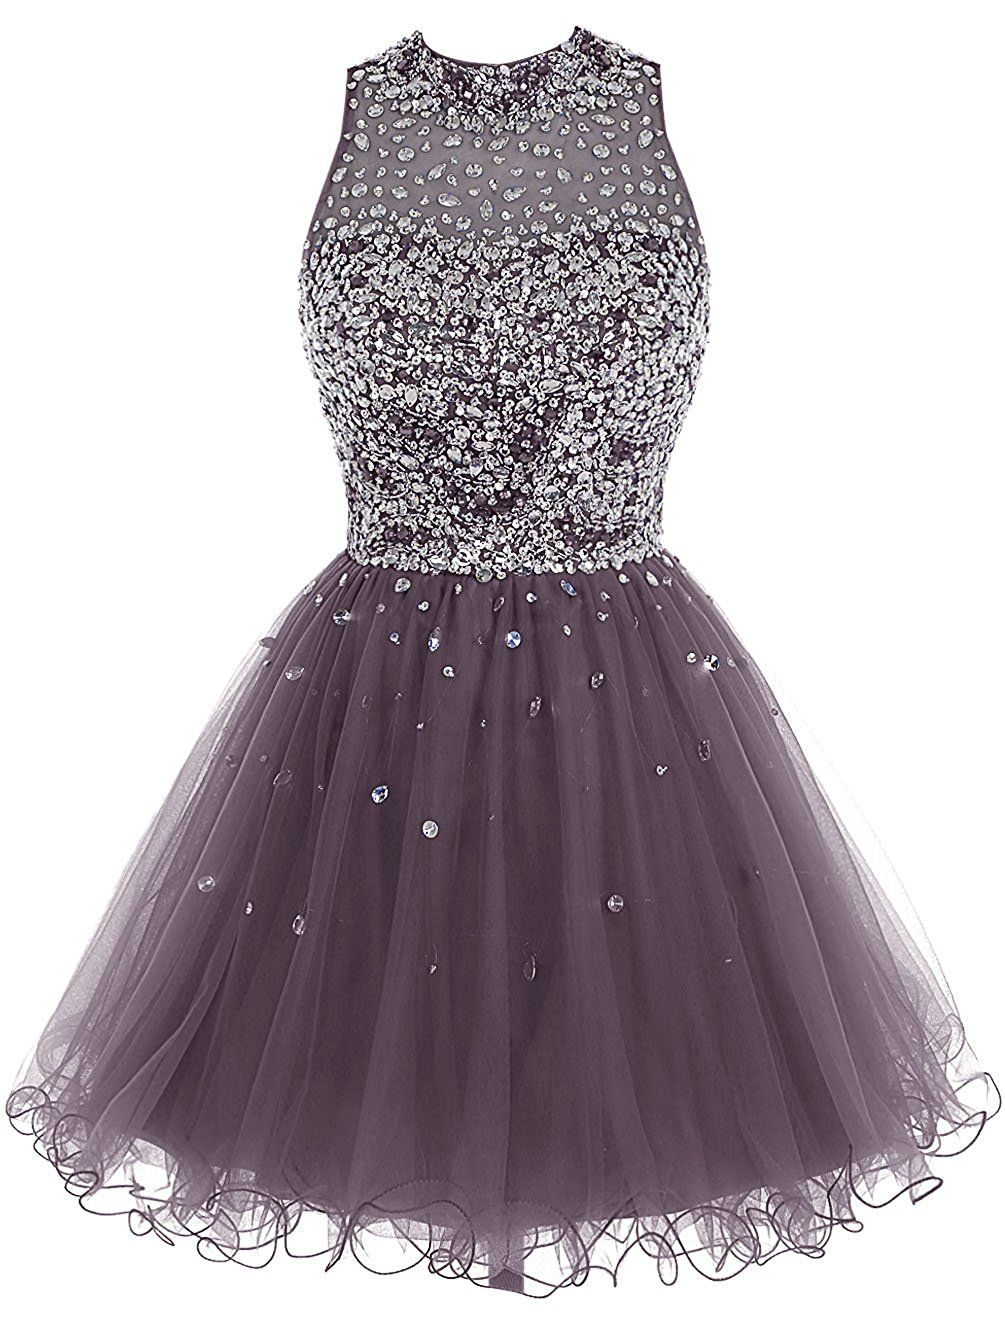 079fe2523478 Short Tulle Beading Homecoming Dress Prom Gown, Rhinestones Beaded ...